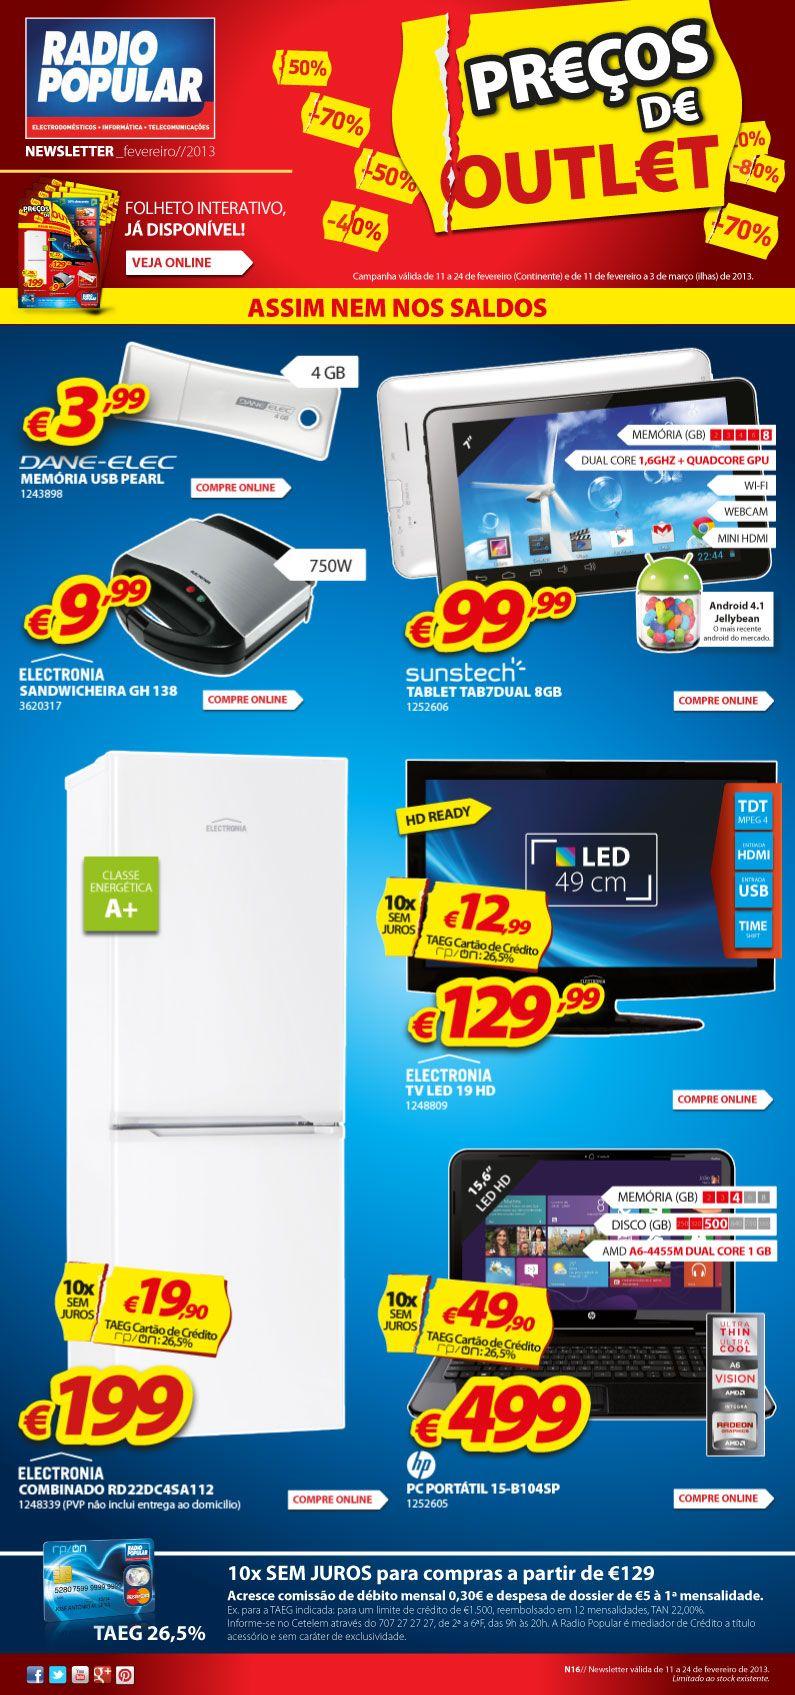 Newsletter -  Assunto: Preços de Outlet.  http://www.radiopopular.pt/newsletter/2013/16/